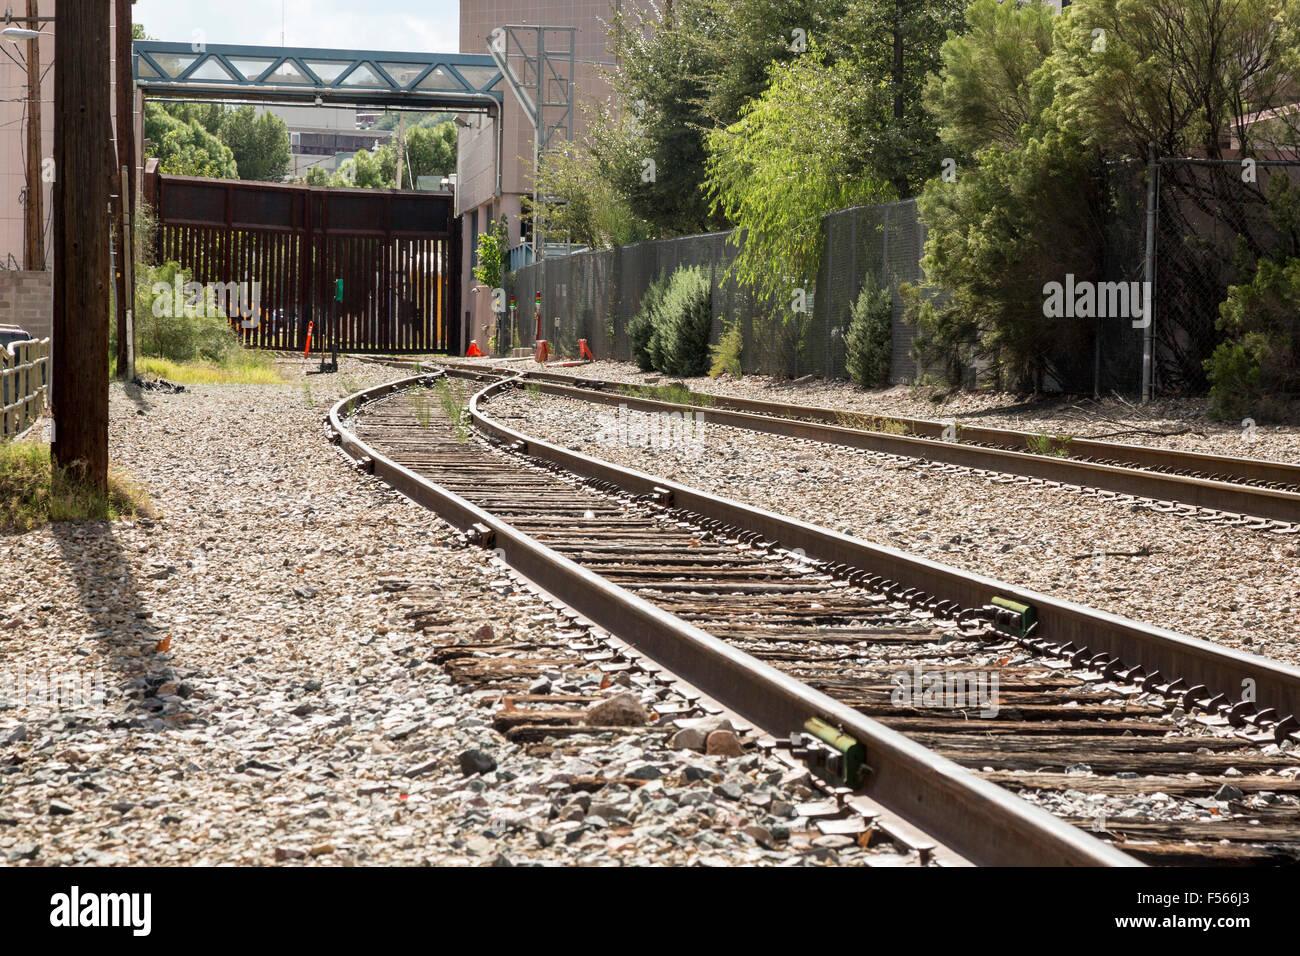 Nogales, Arizona - A fence blocks train tracks at the international border corssing into Mexico. - Stock Image